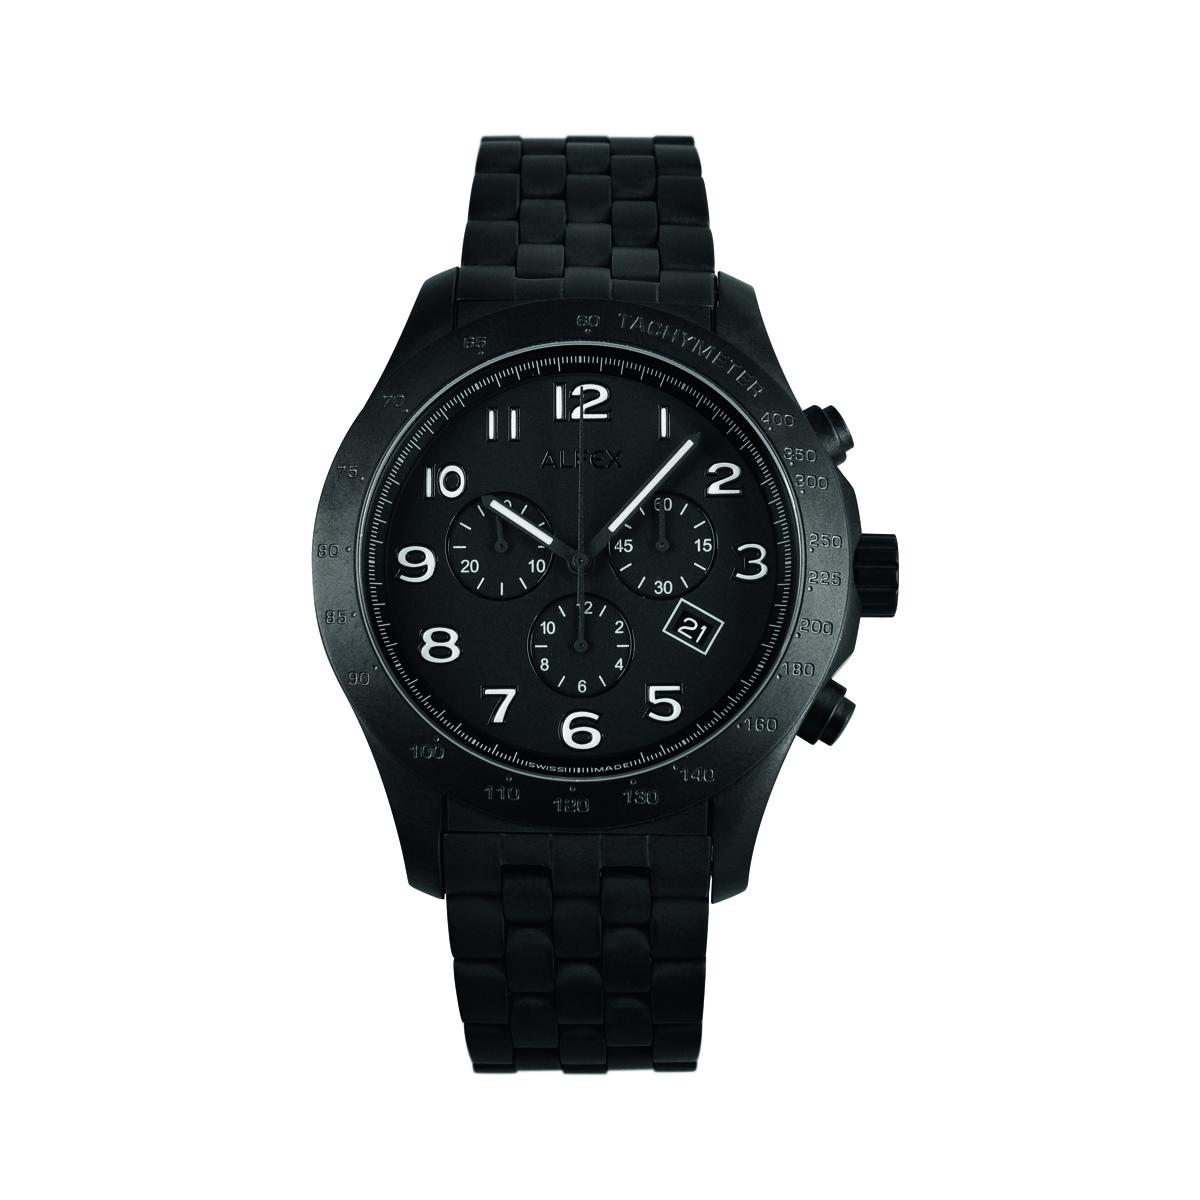 Orologio uomo Alfex 5680810